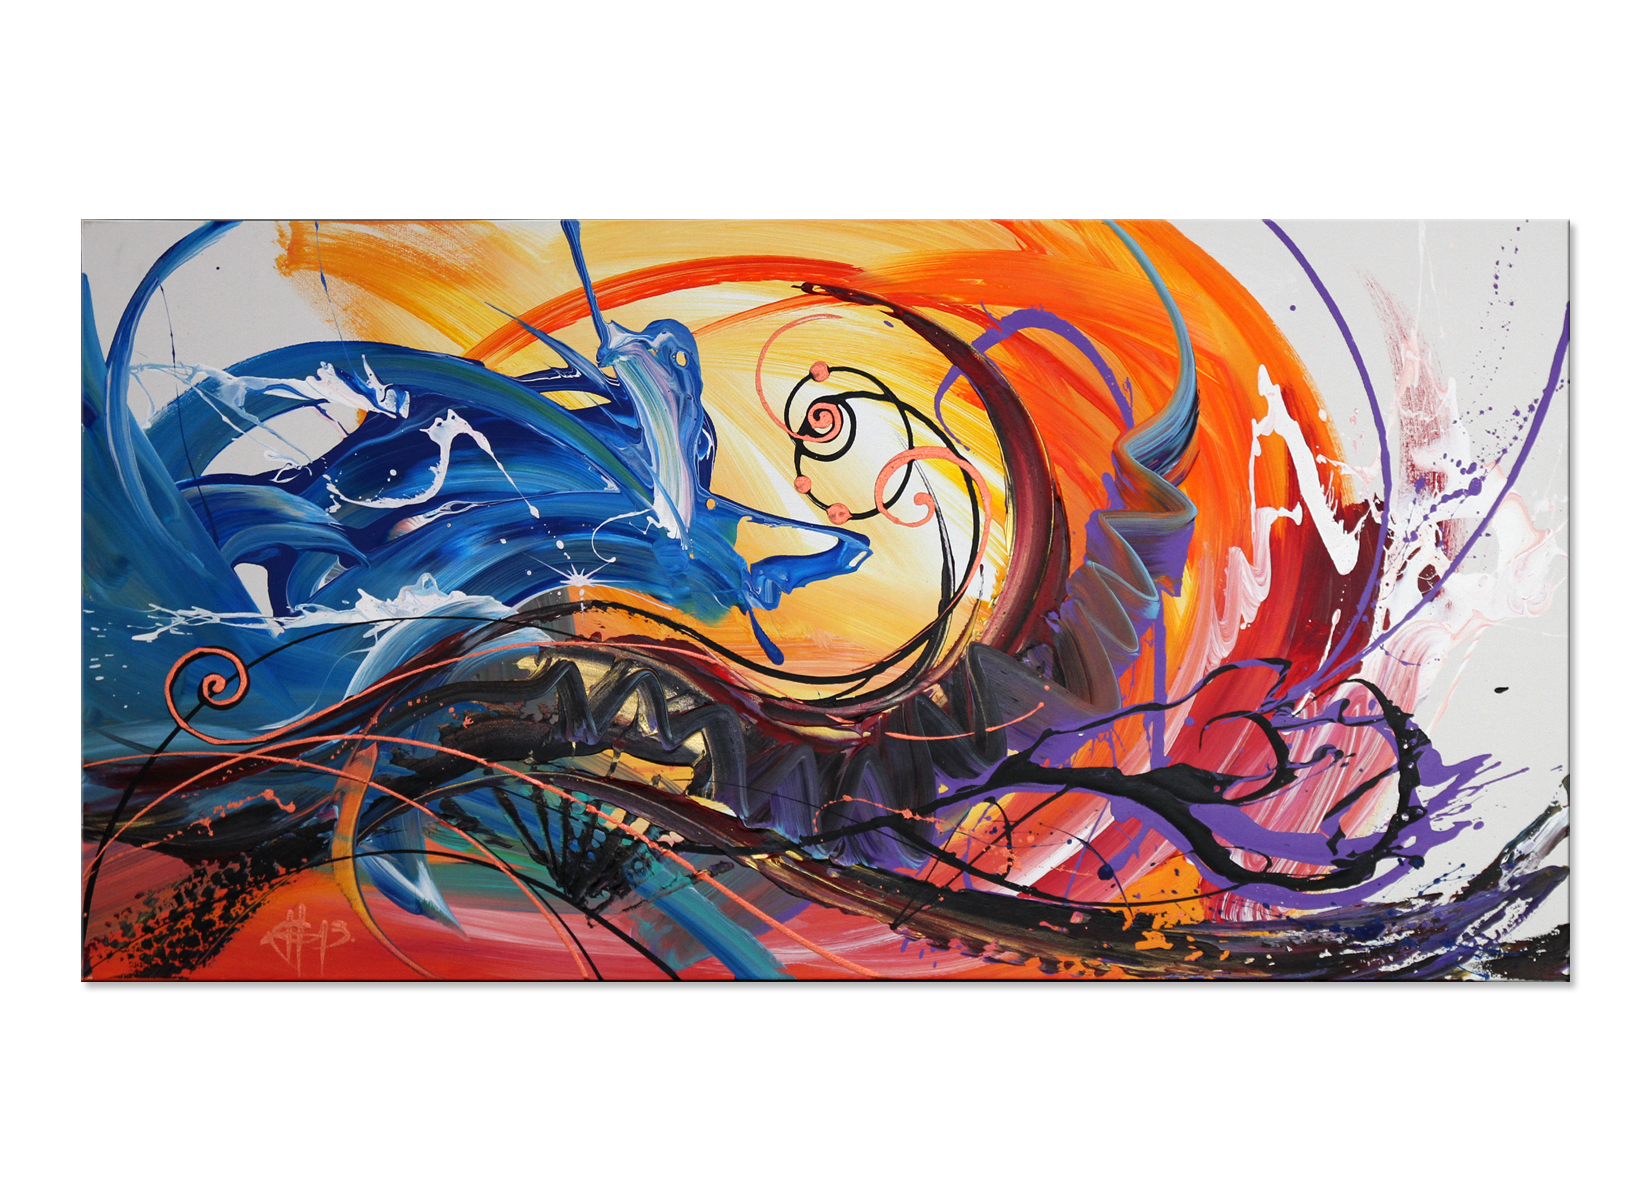 Kunst Bilder Kaufen Broken Wheel Acrylbild Galerie Inspire Art